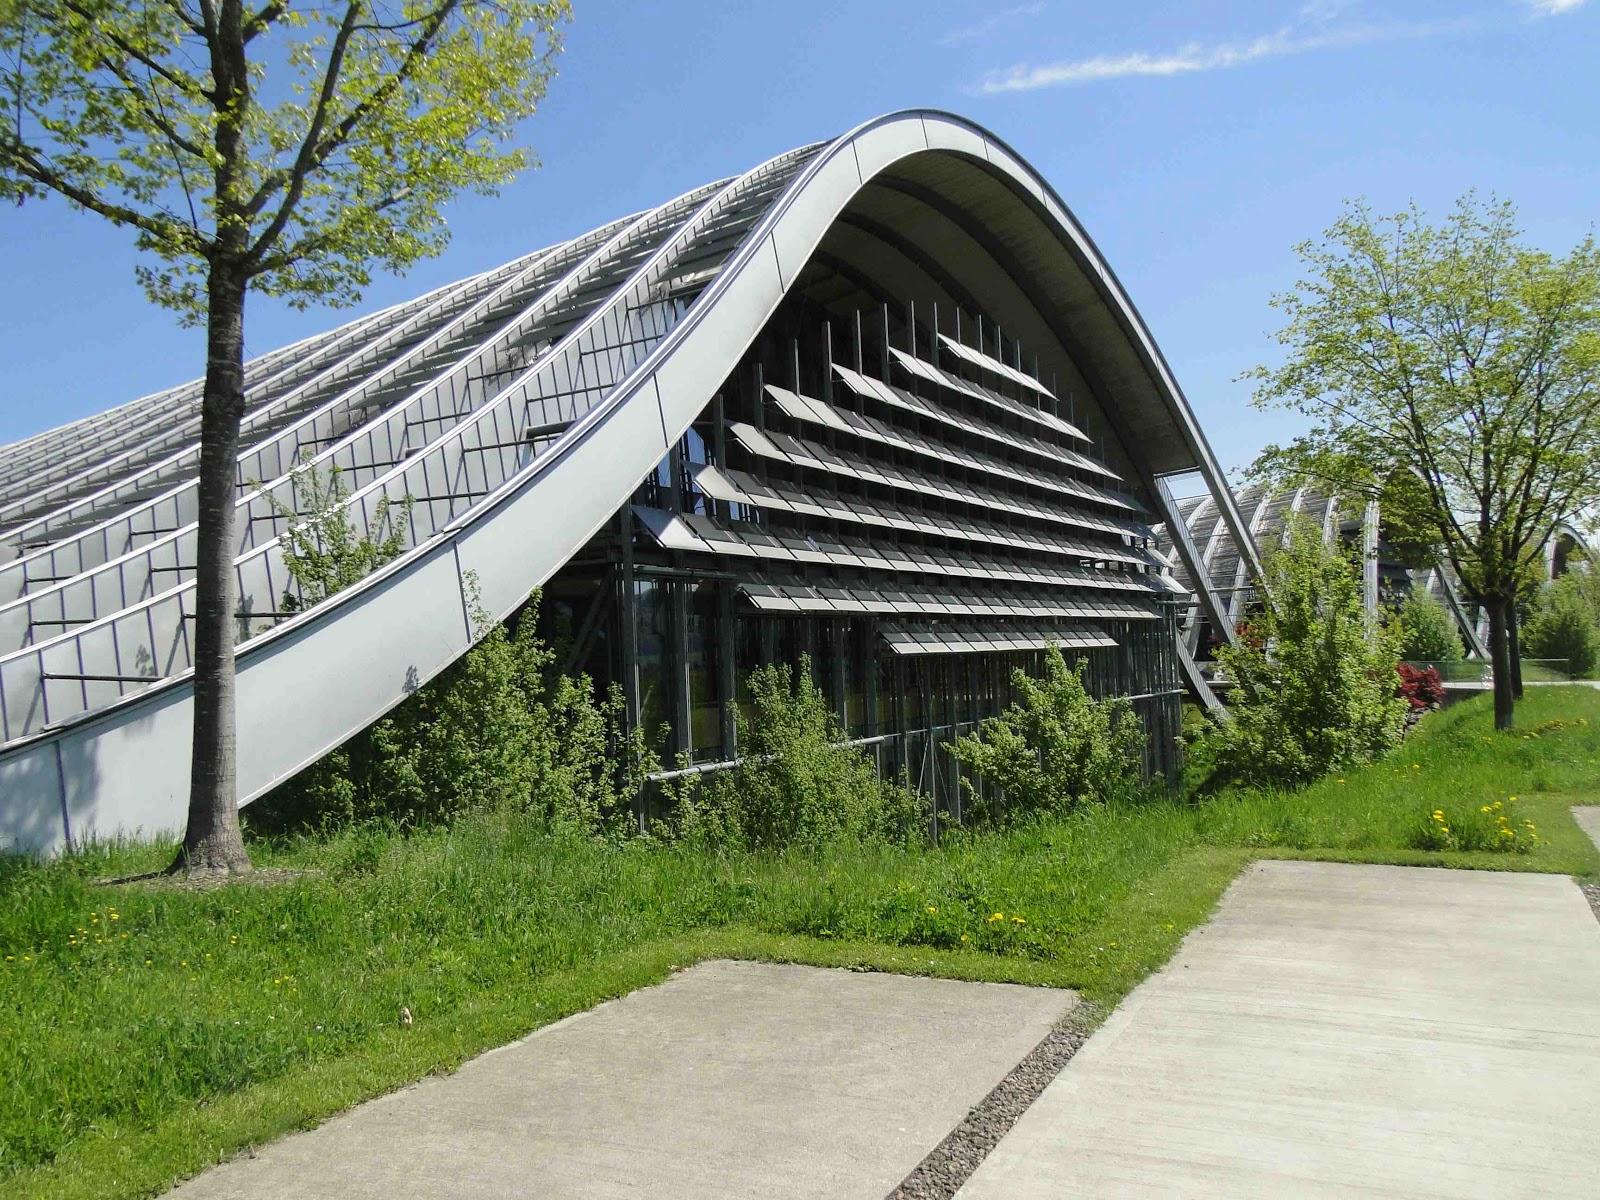 B atrice de le mus e paul klee berne architecture for Architecture contemporaine